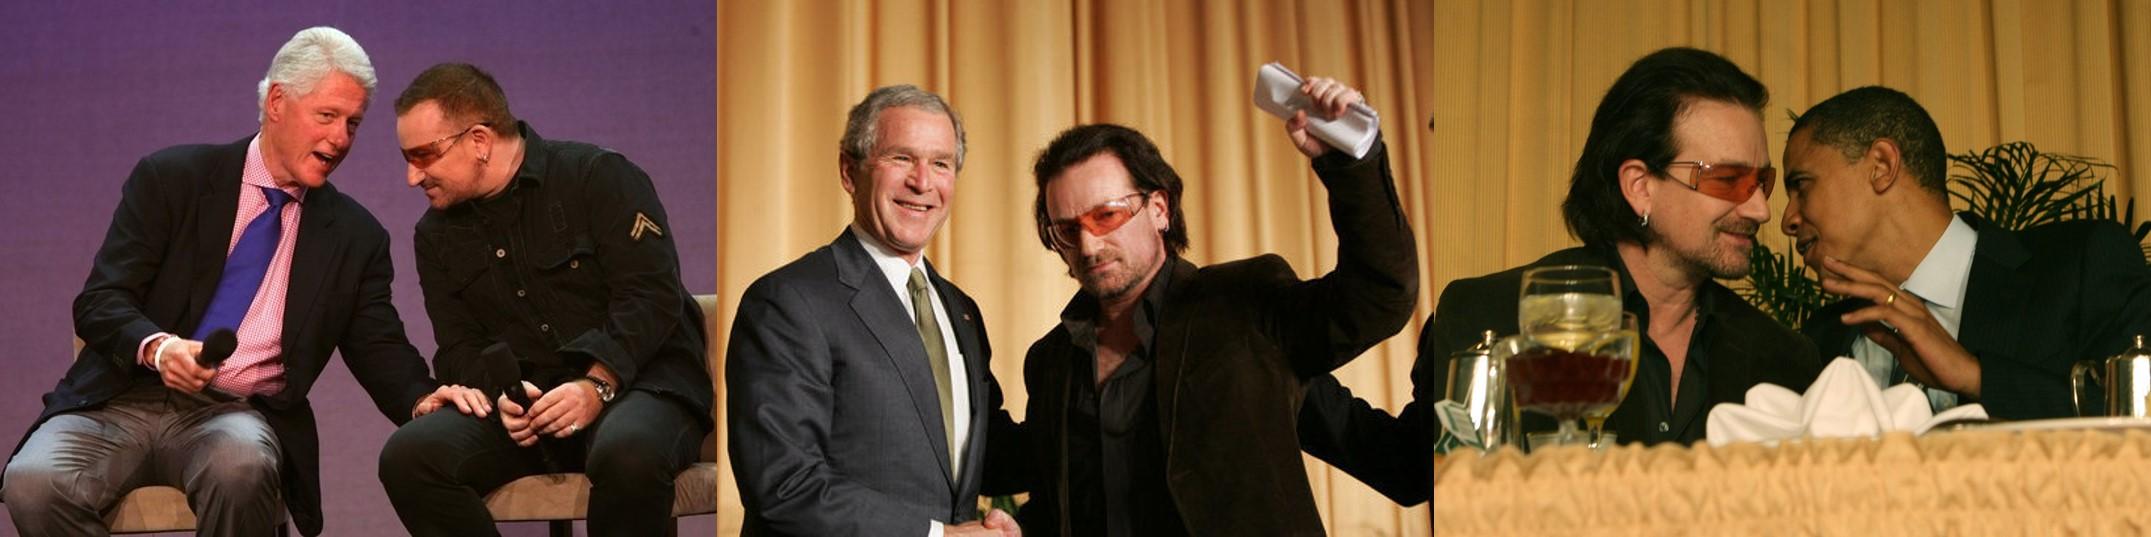 Bono and presidents.jpg